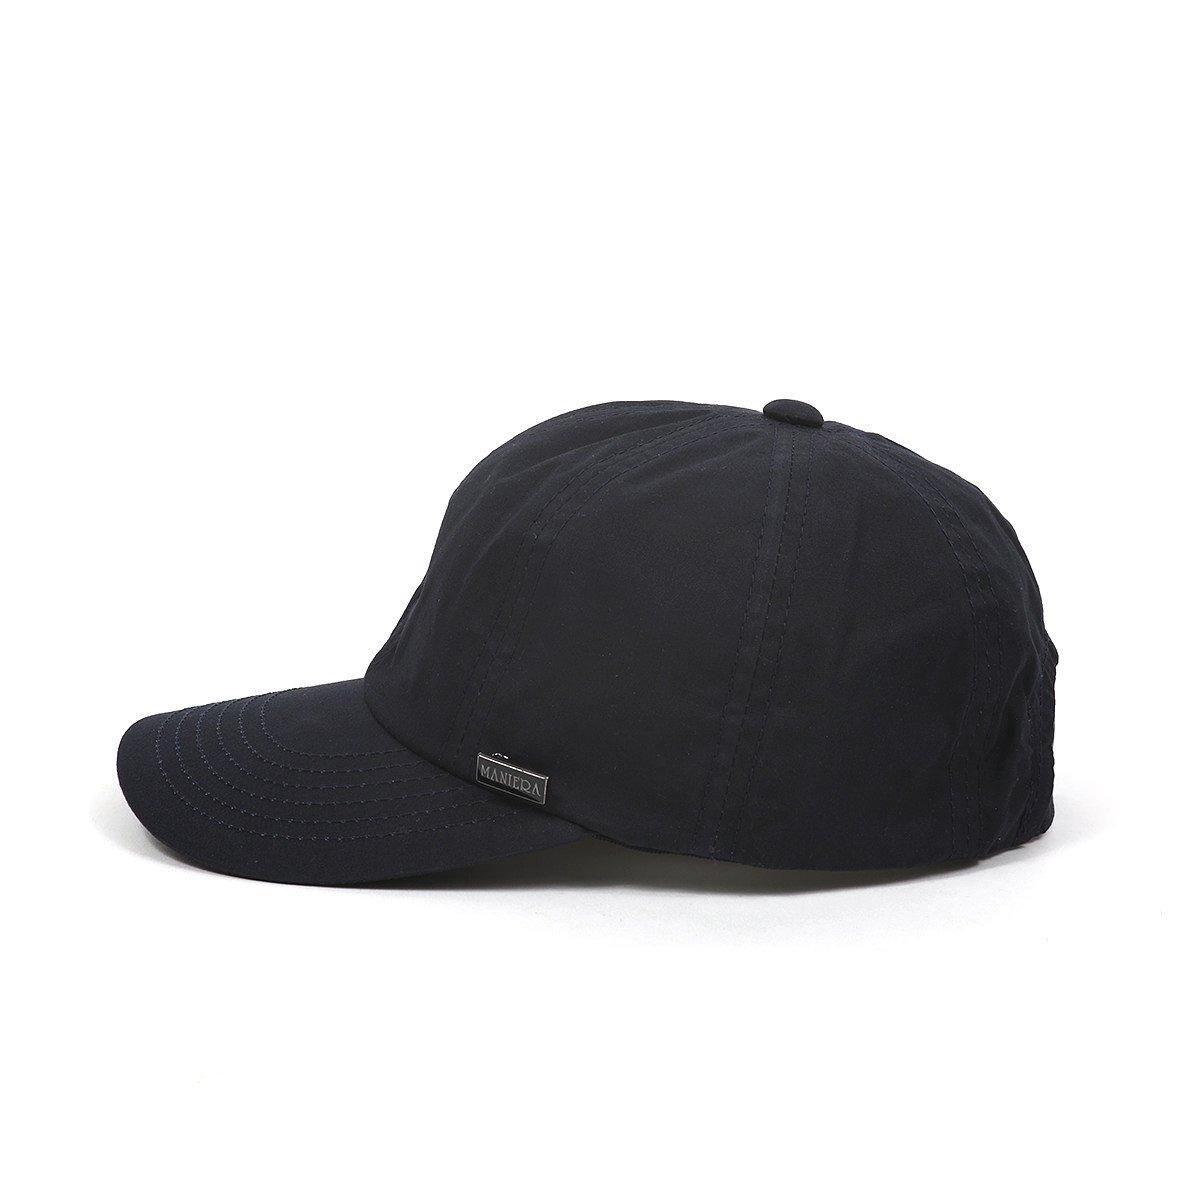 PRAFFIN CAP 詳細画像2